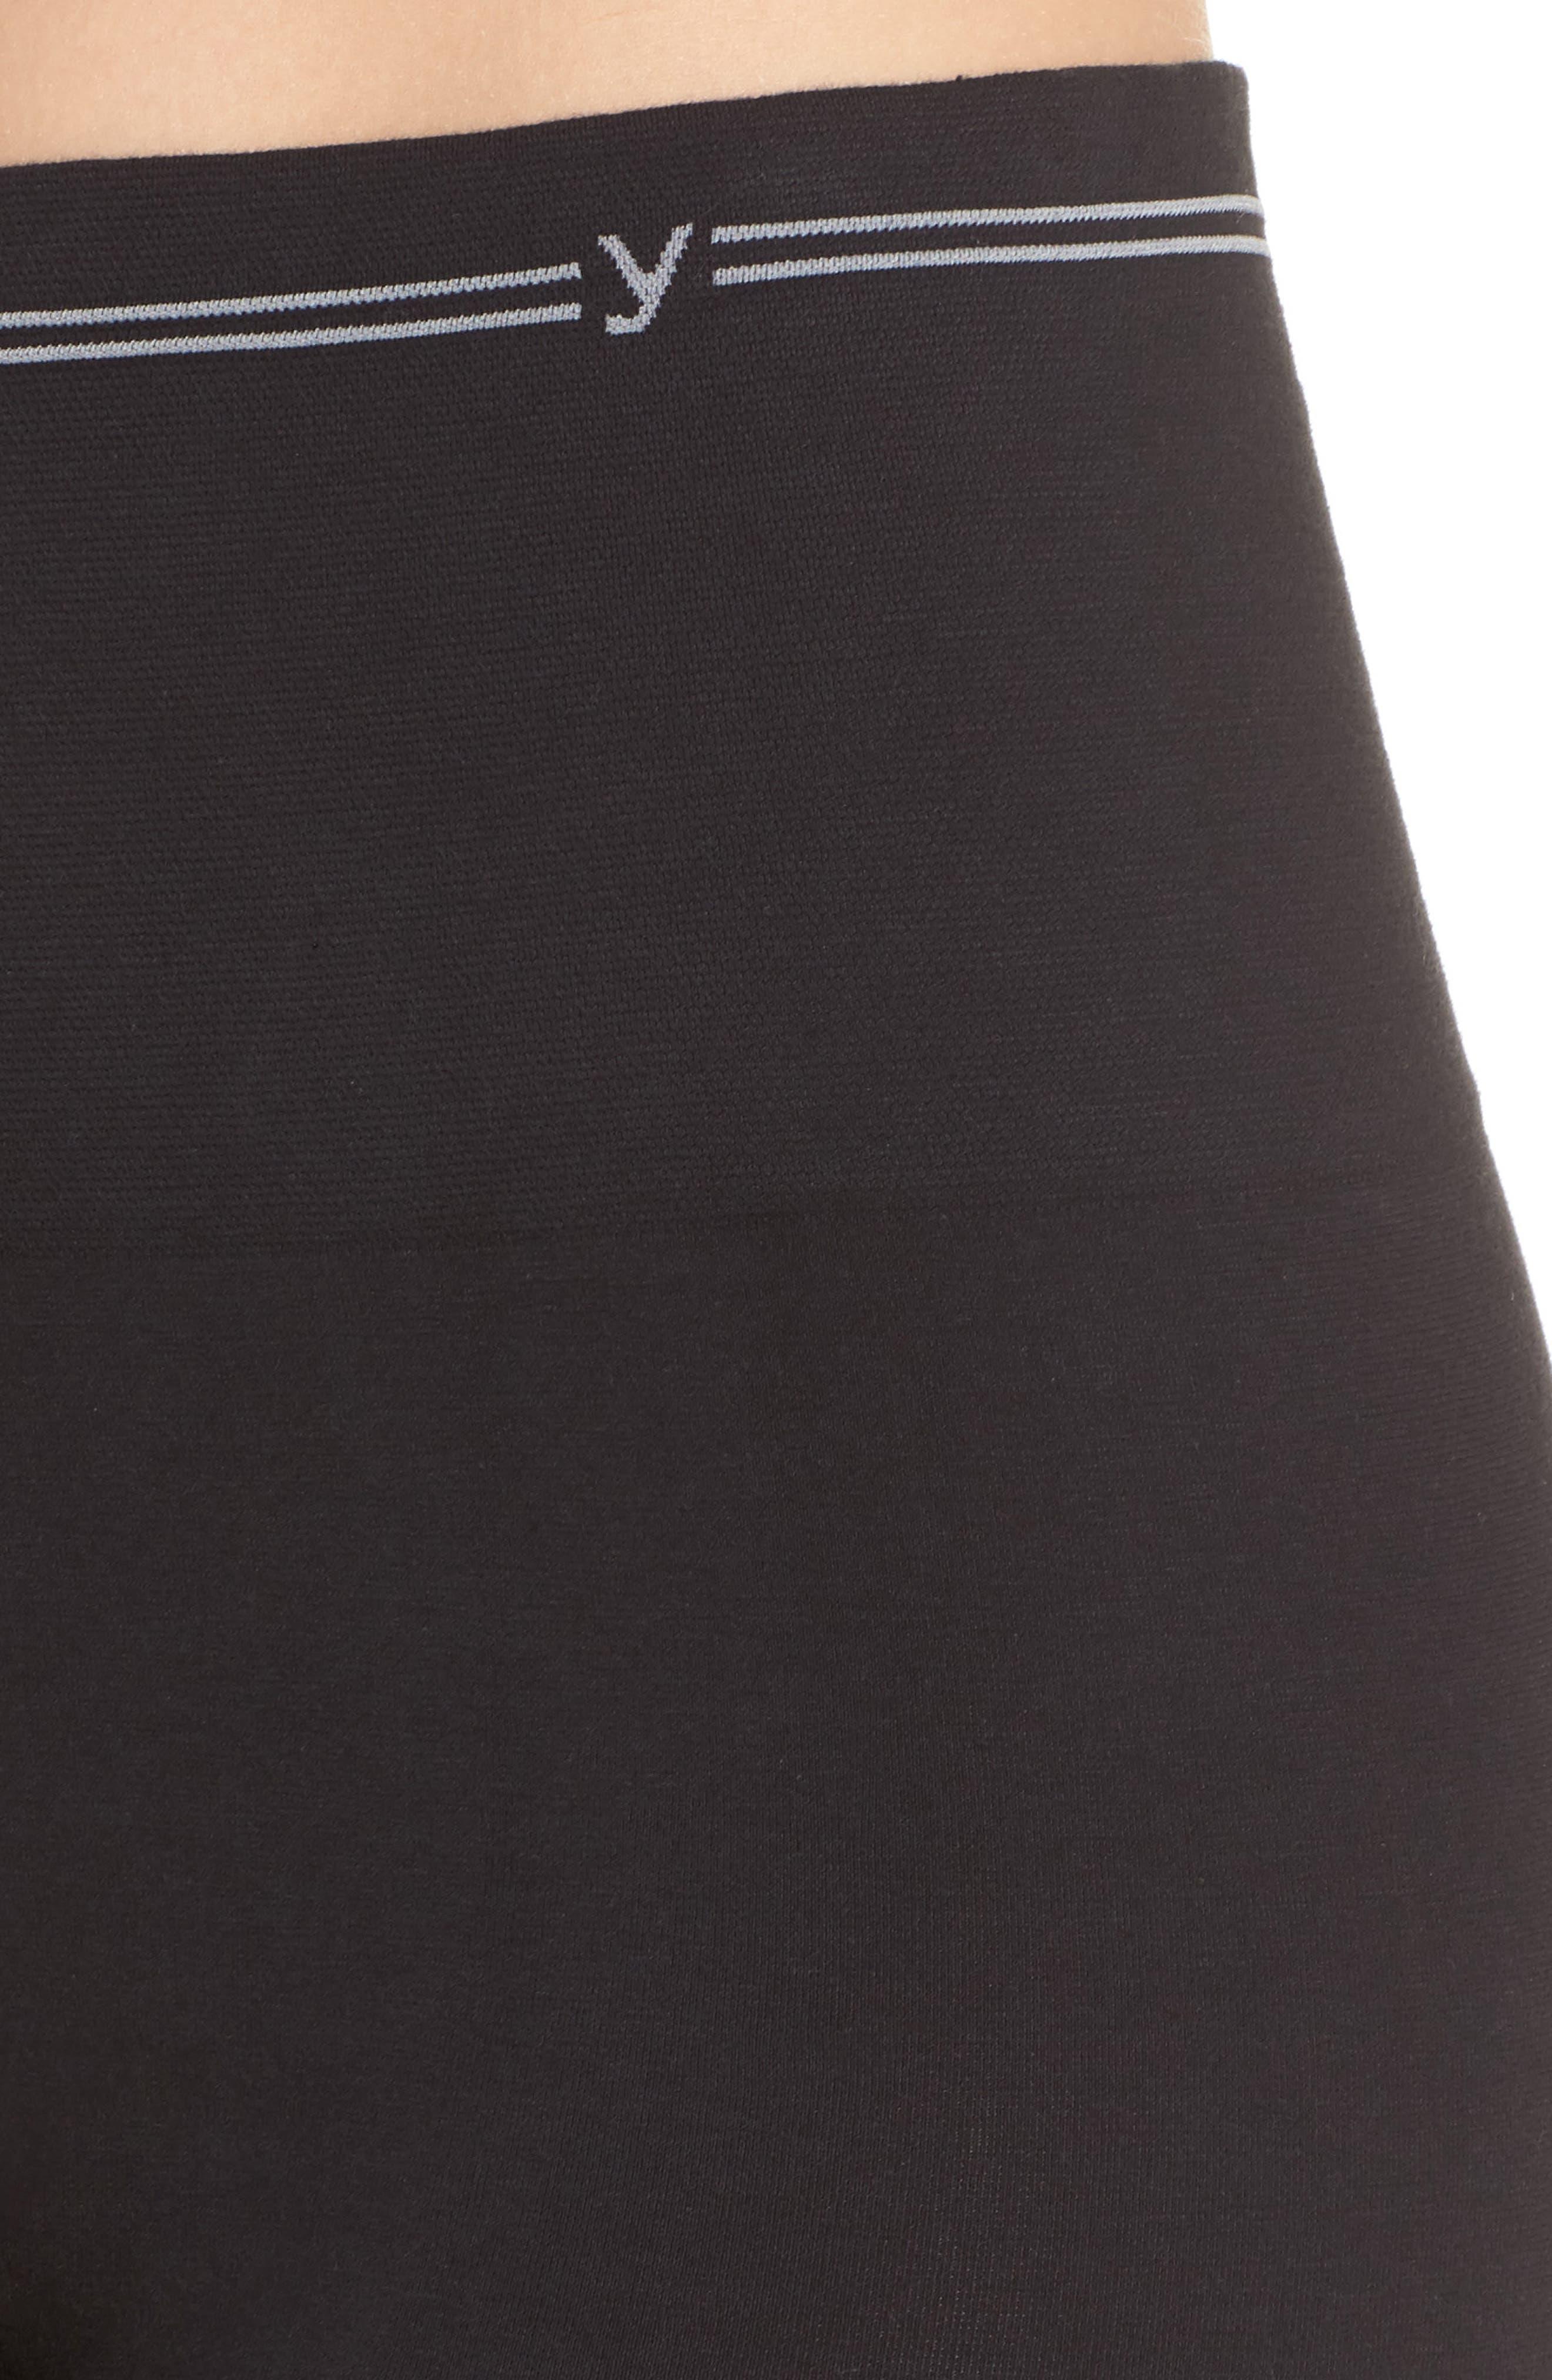 YUMMIE,                             Seamless Shaping Shorts,                             Alternate thumbnail 4, color,                             001